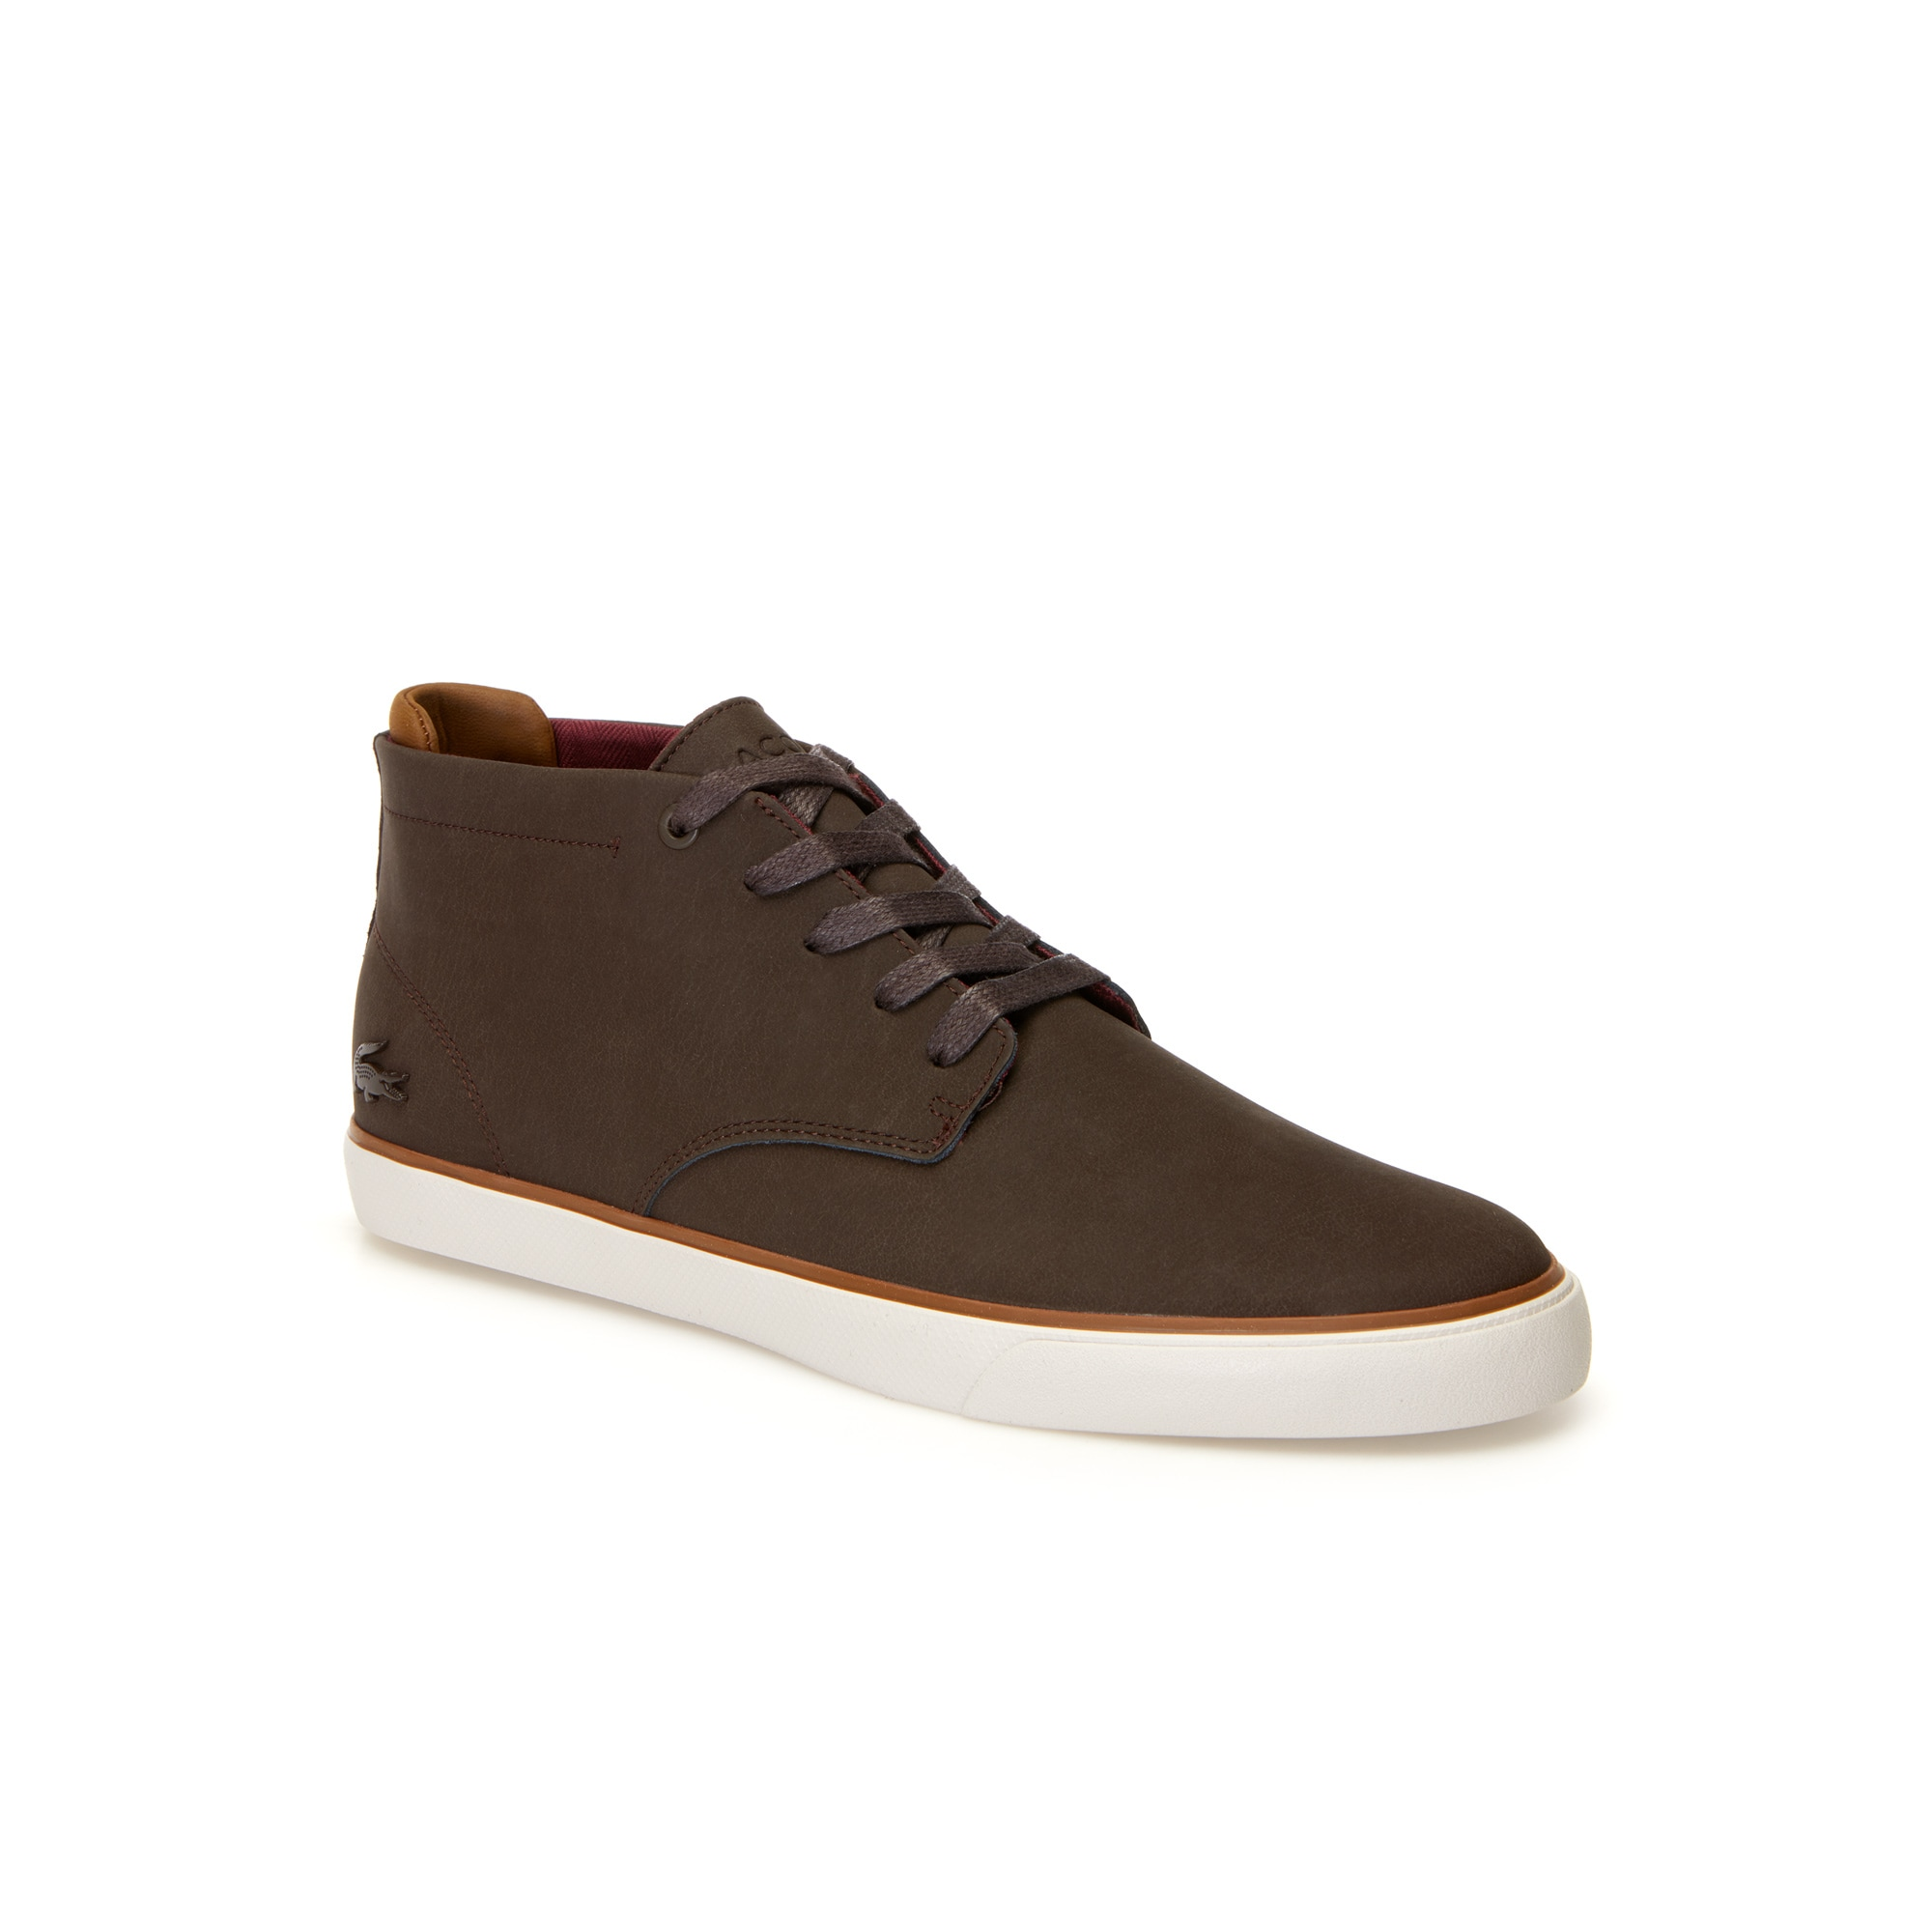 Herren-Sneakers ESPARRE CHUKKA aus Leder und Veloursleder